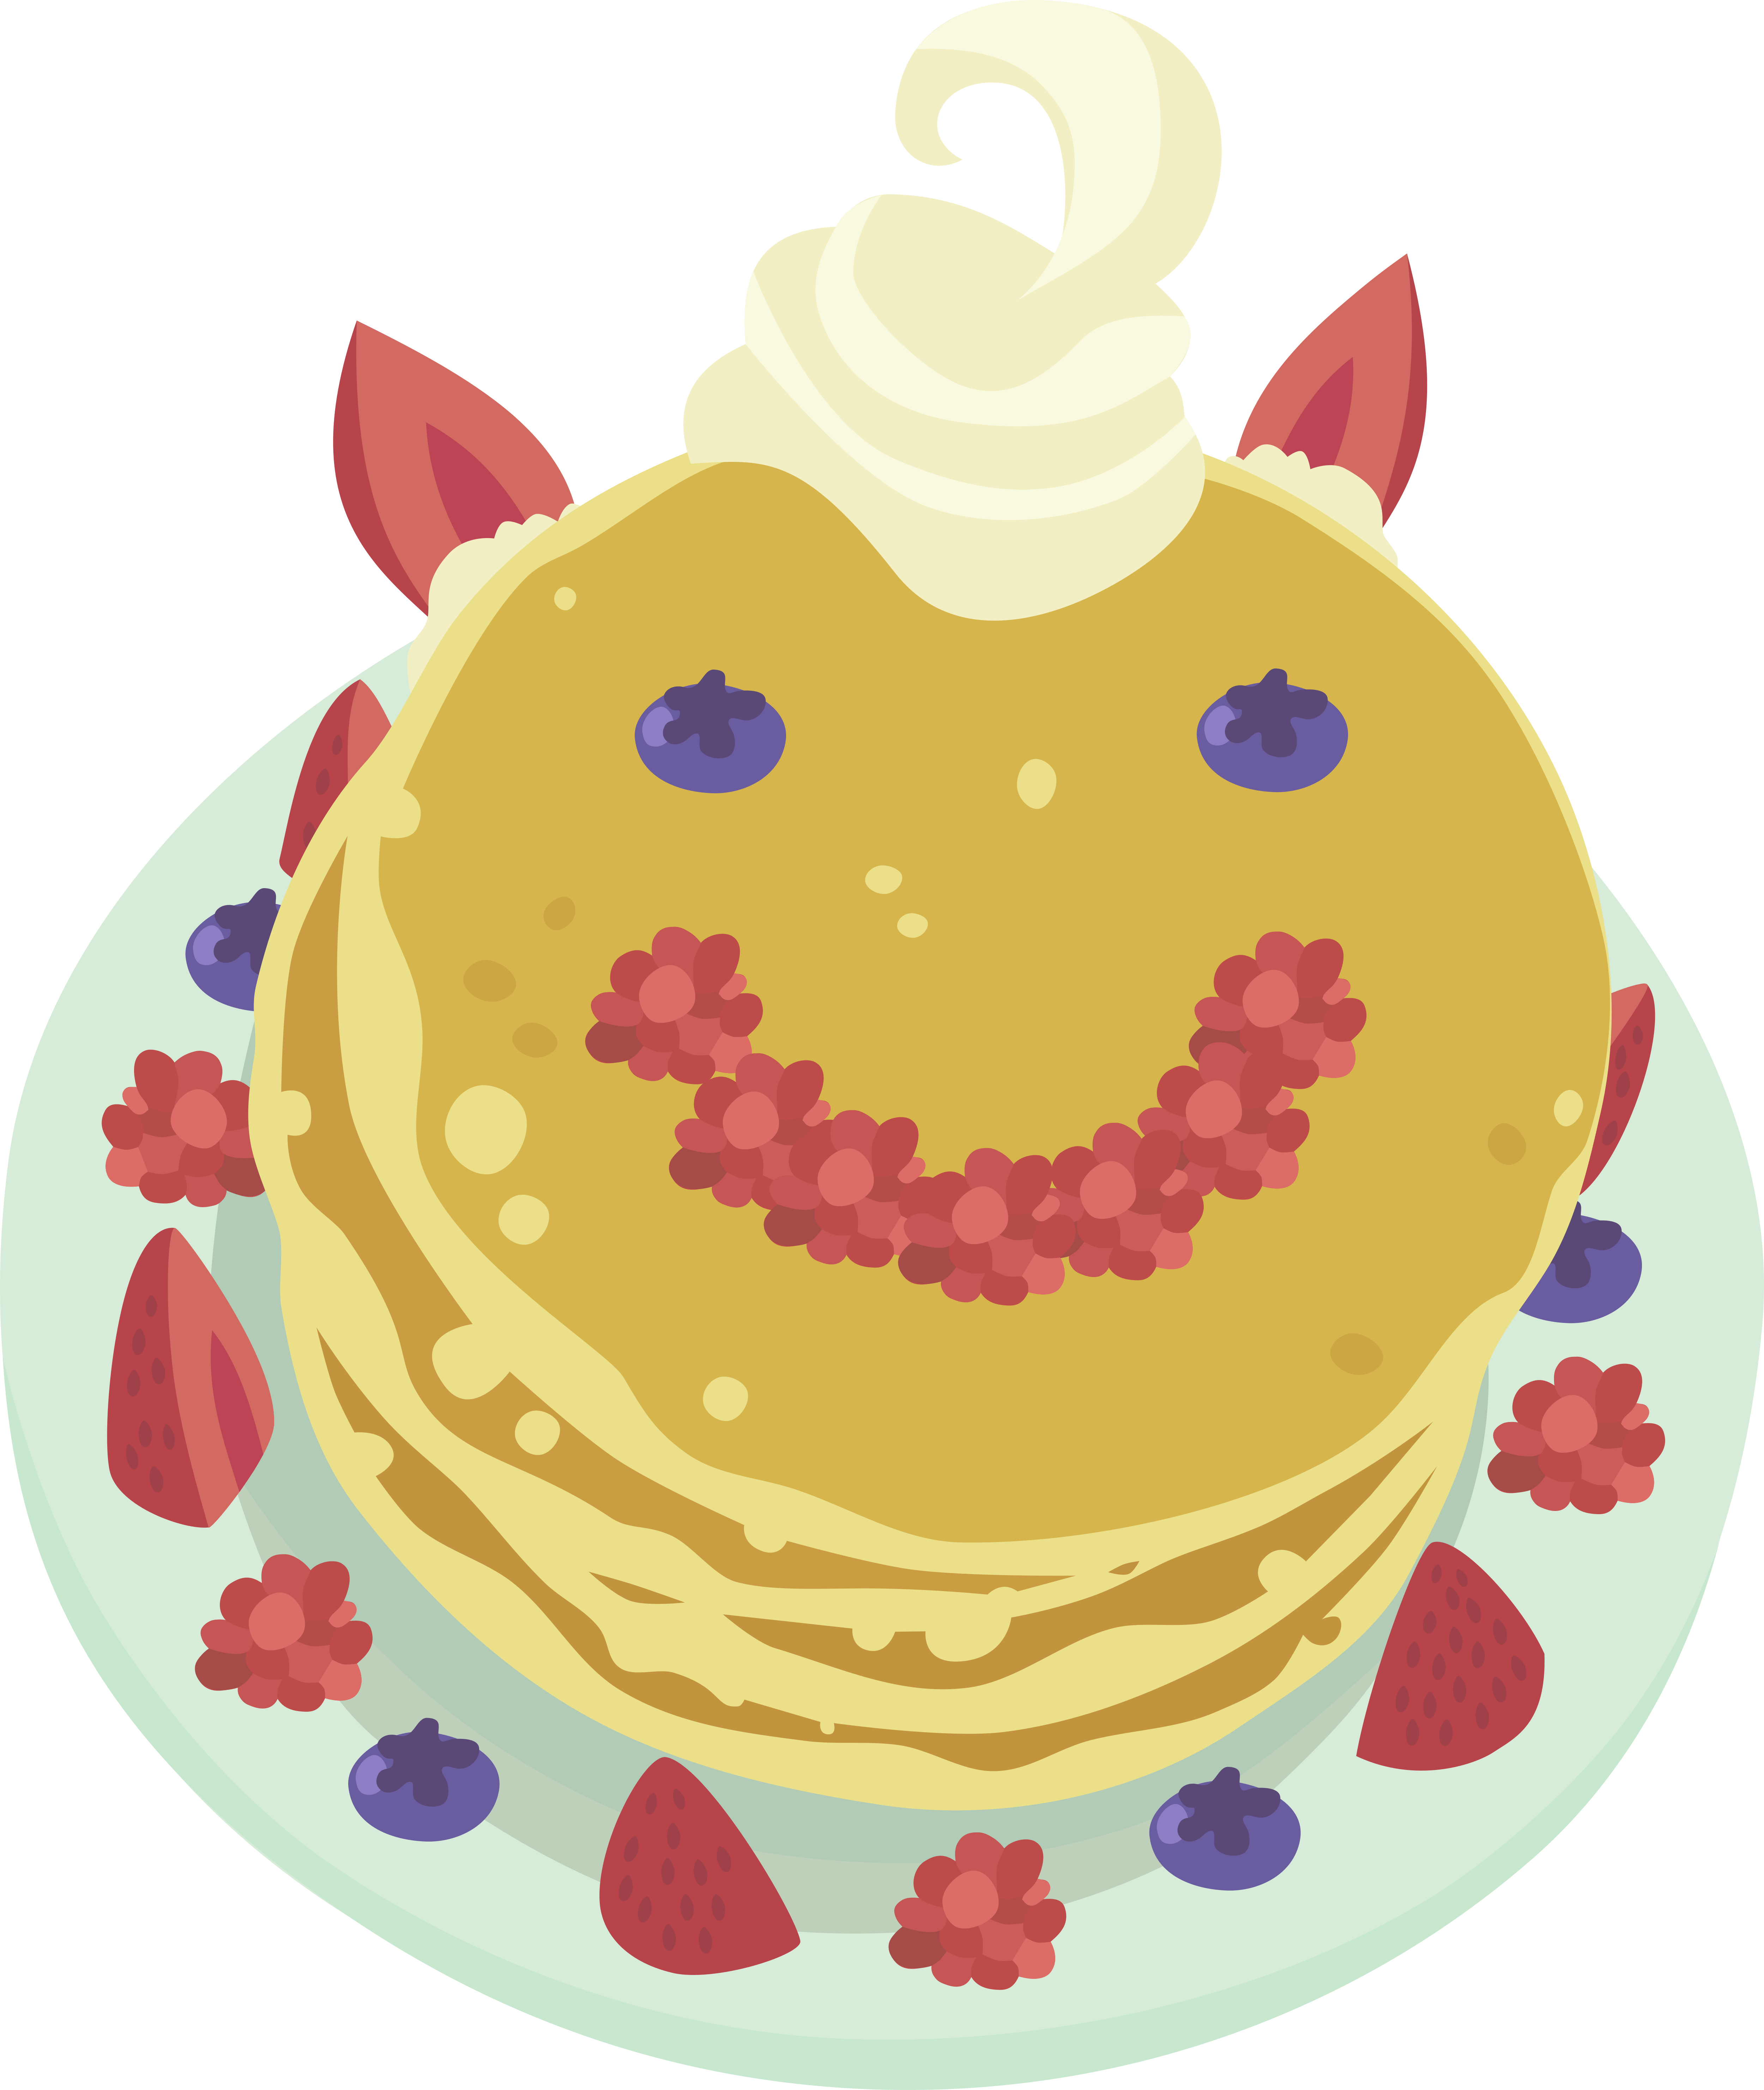 absurd res a. Pancakes clipart plain